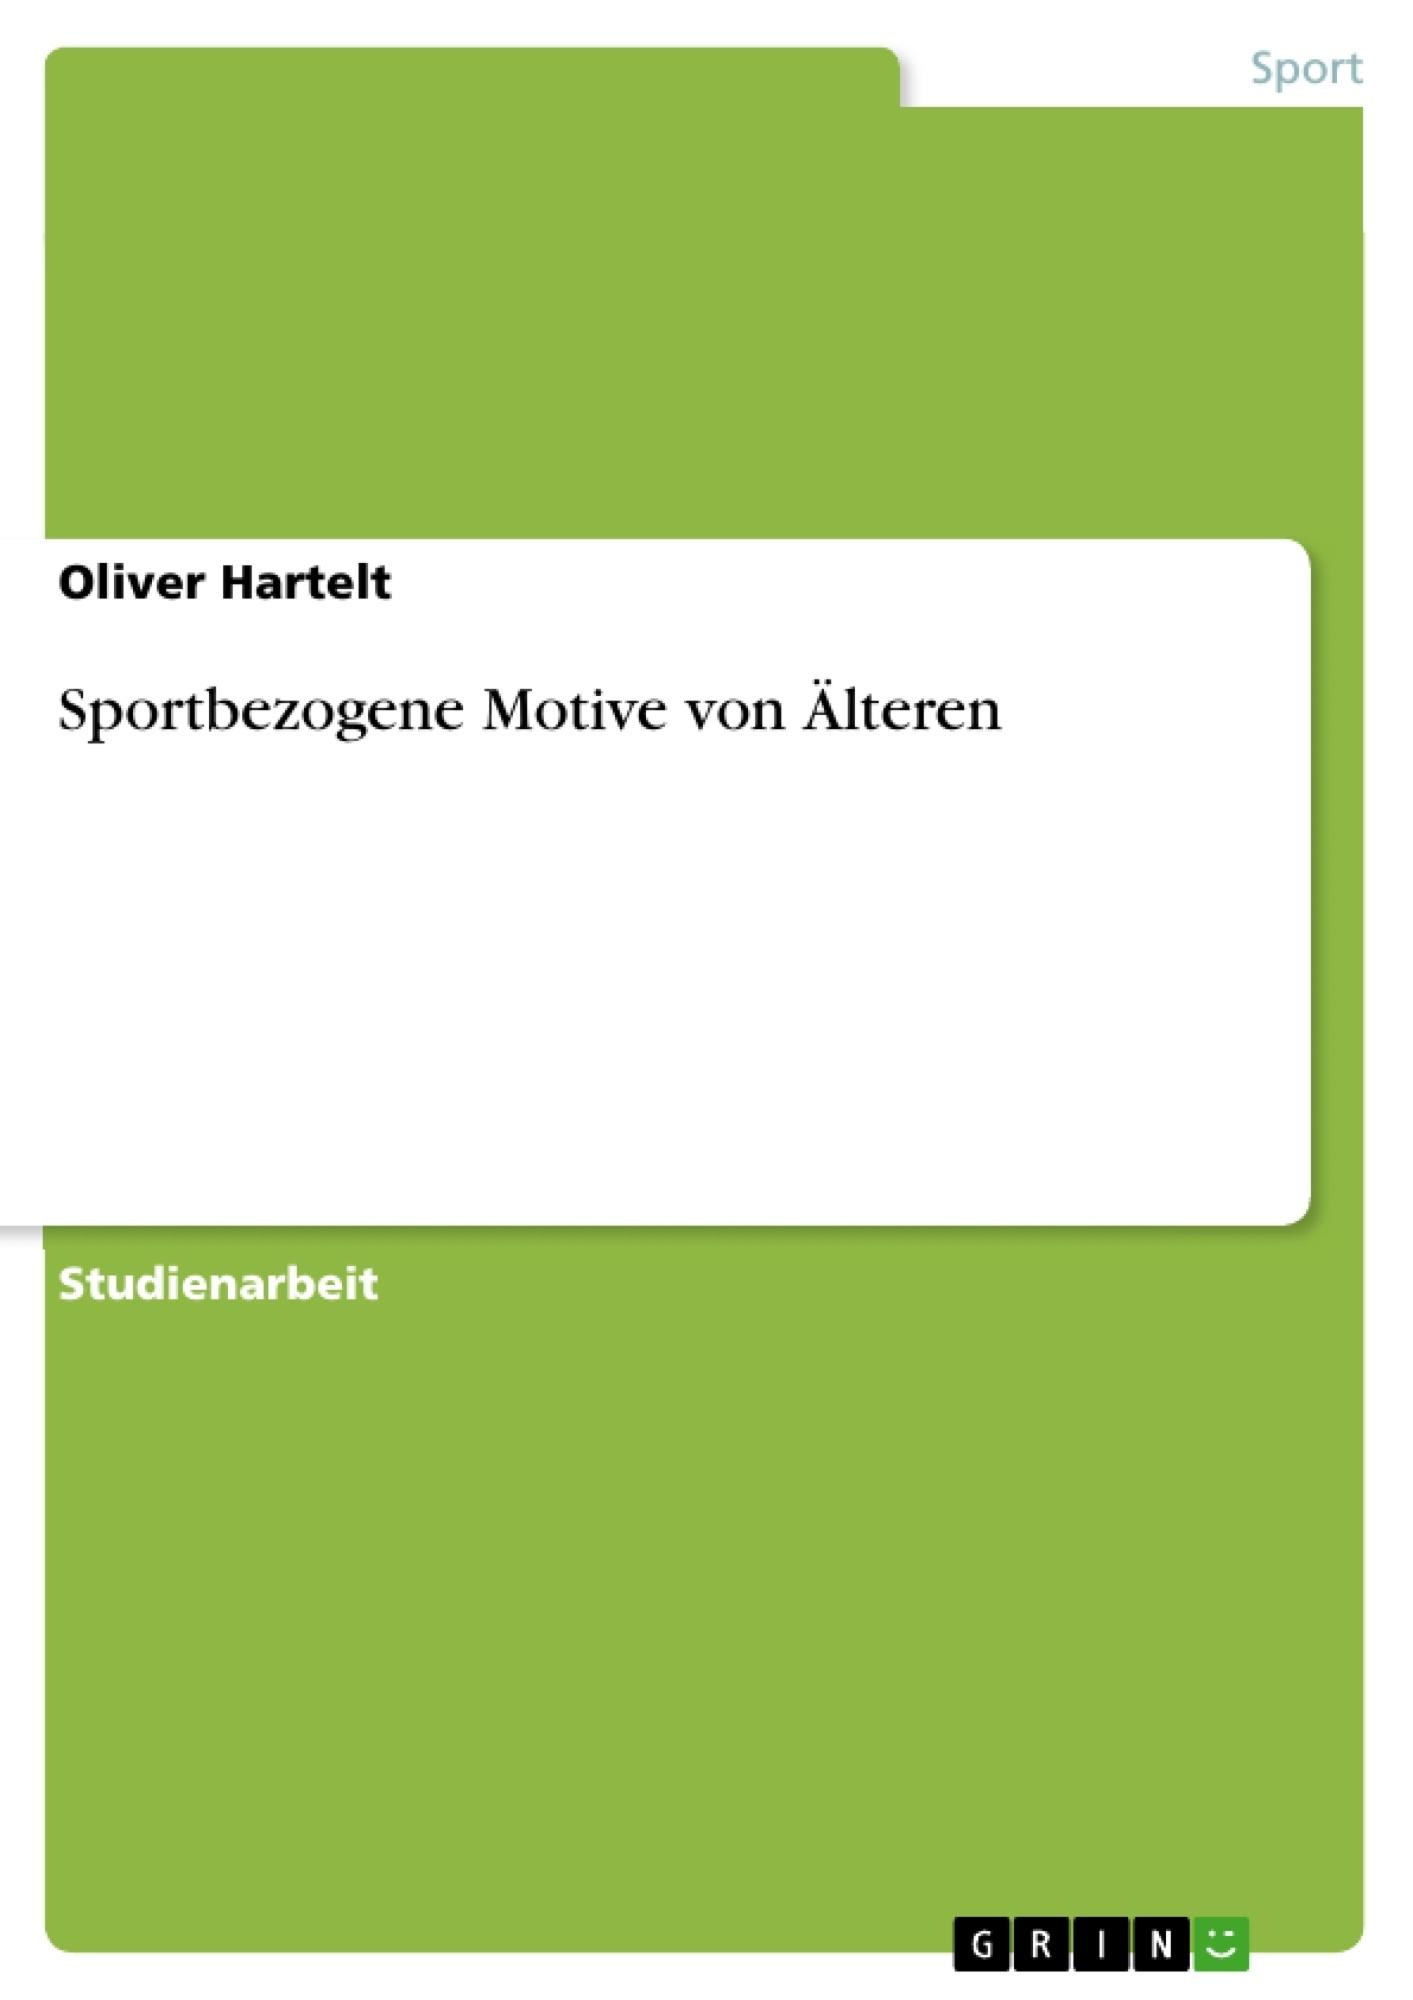 Titel: Sportbezogene Motive von Älteren